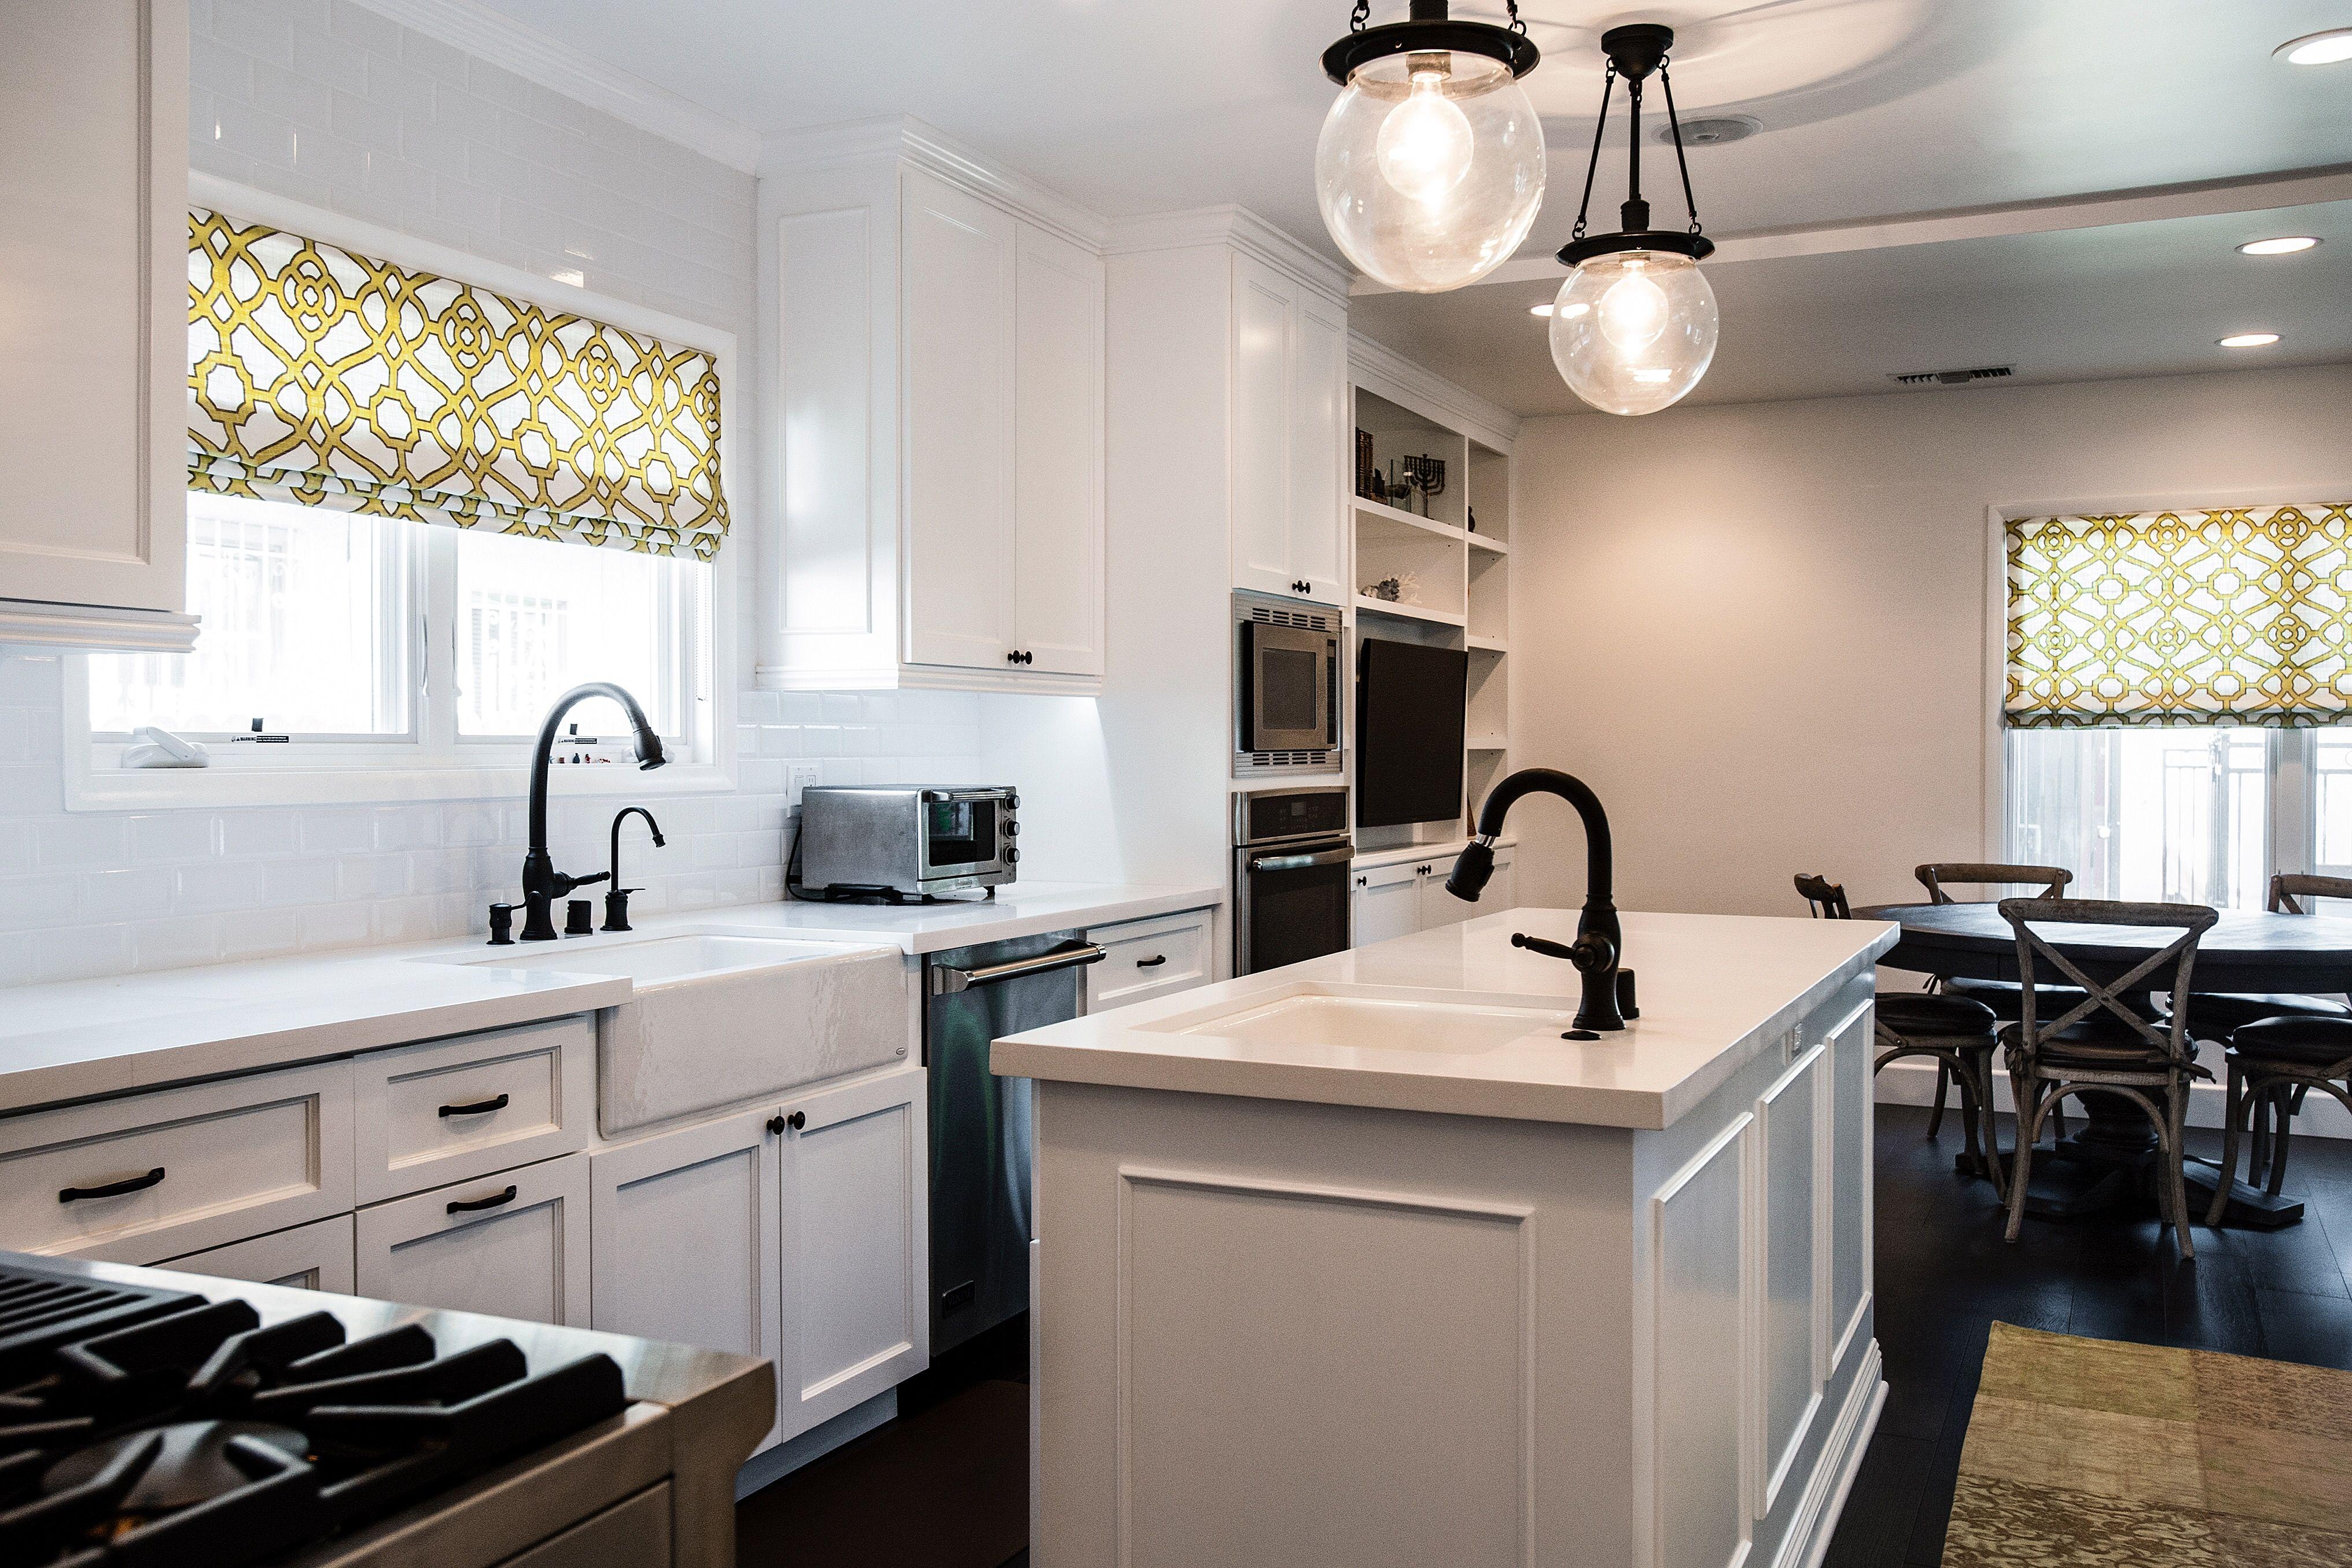 White kitchen, oil rubbed bronze hardware, Caesar stone countertops, white subway tile